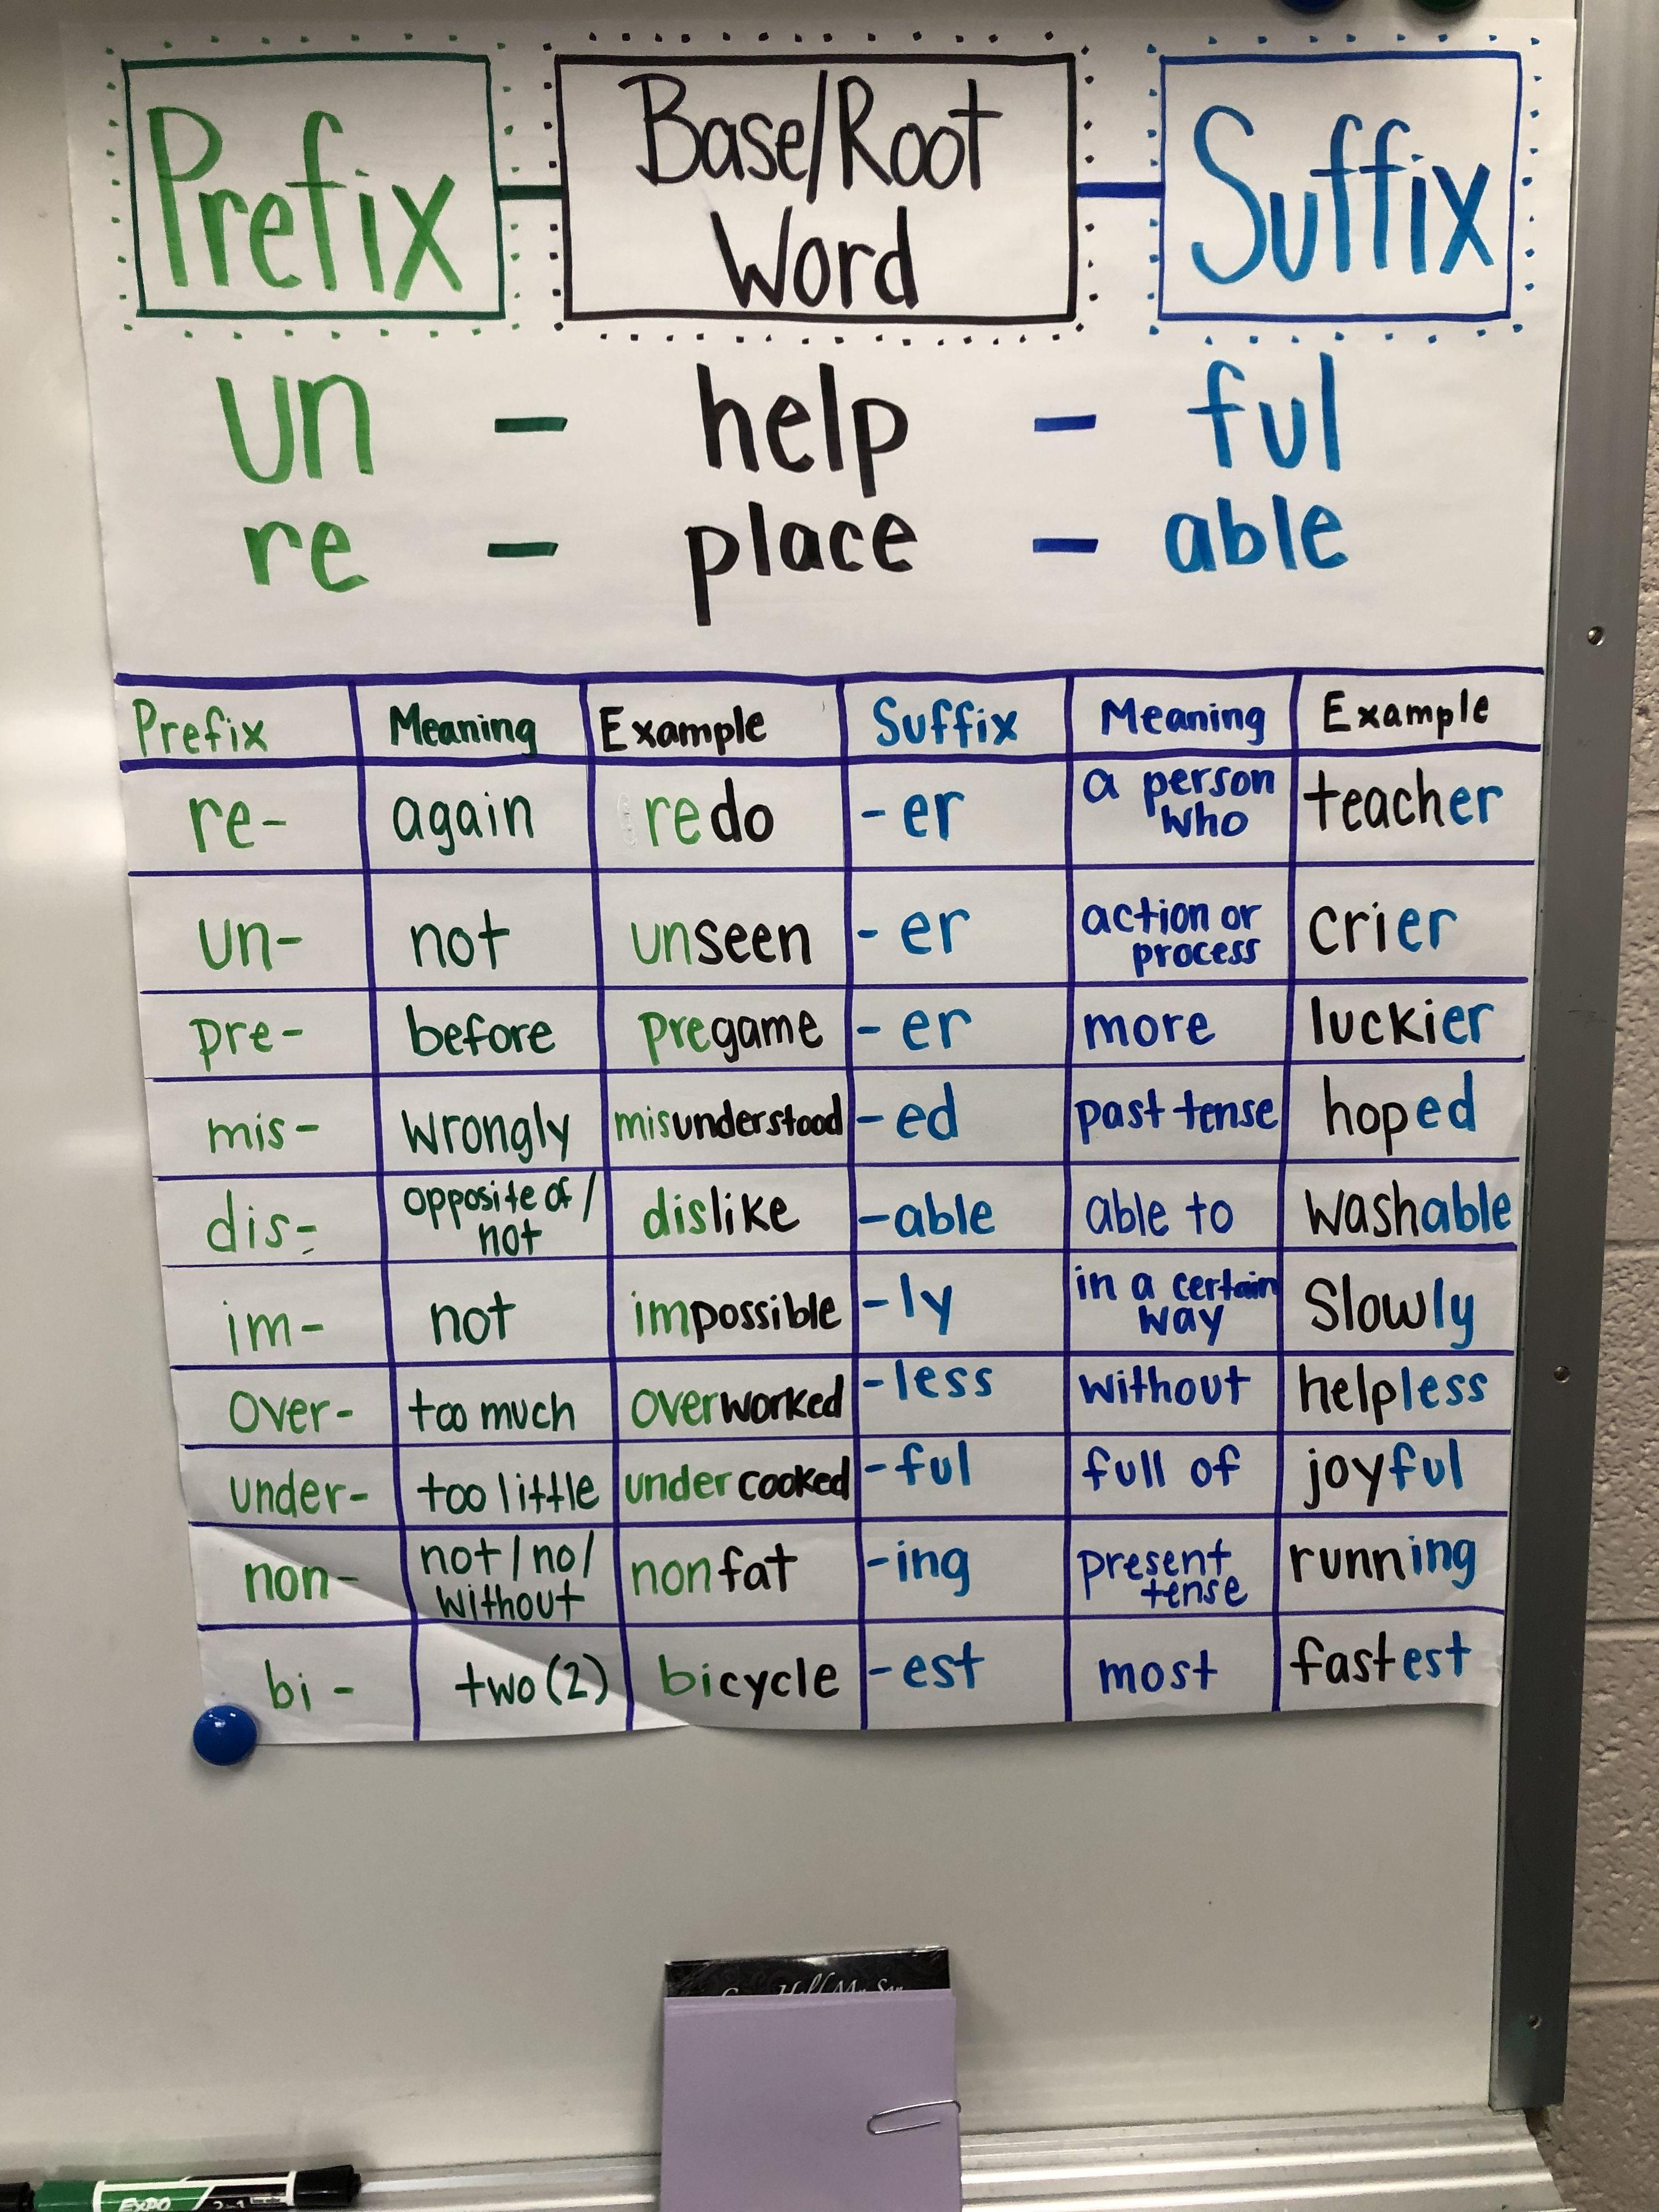 Prefixes and Suffixes anchor chart   Suffixes anchor chart [ 4032 x 3024 Pixel ]